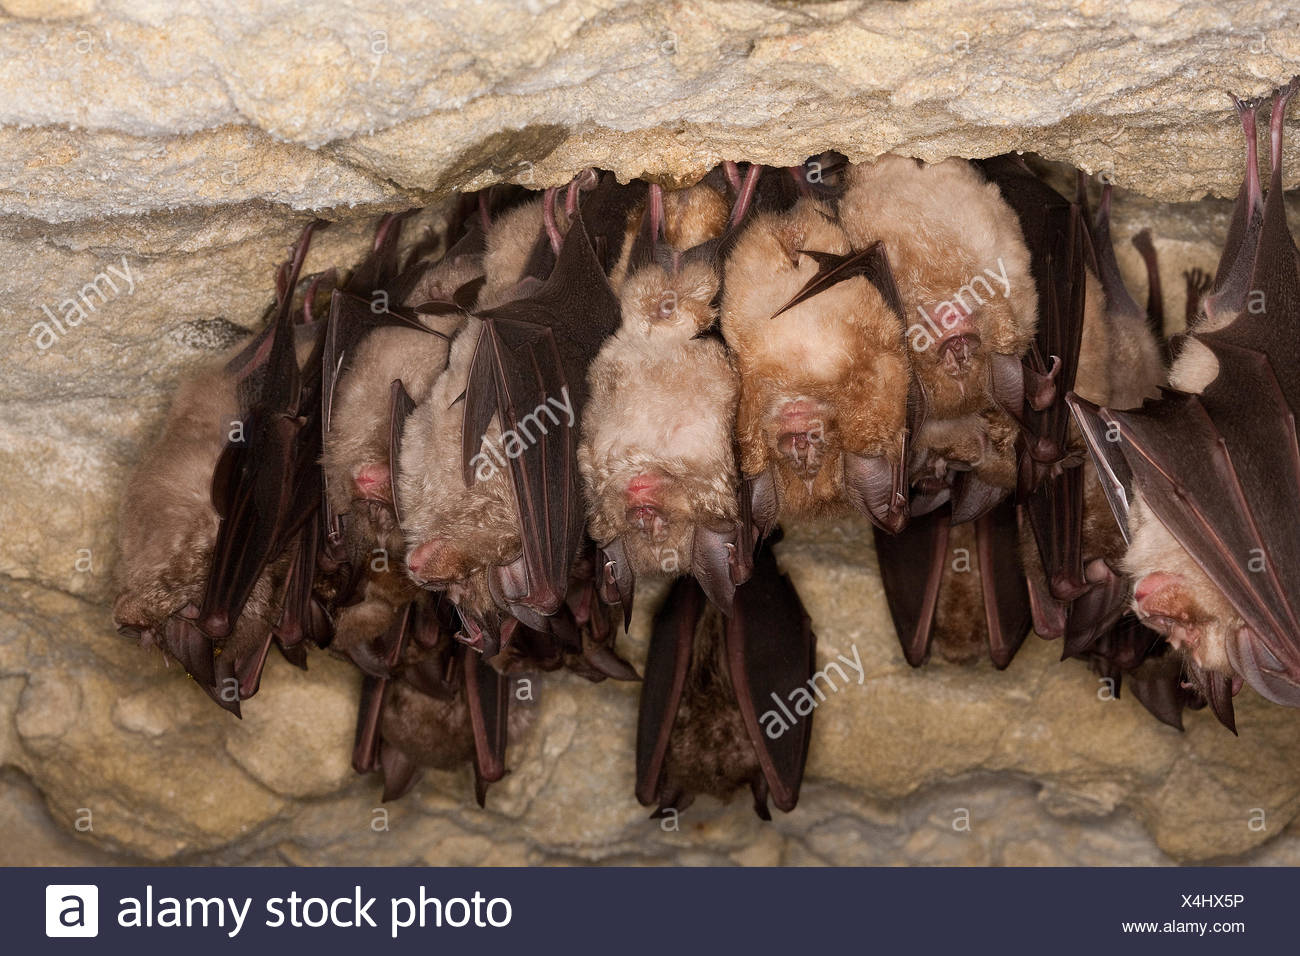 Greater Horseshoe Bat, rhinolophus ferrumequinum, Colony Hibernating, Hanging from Cave's Ceiling, Normandy - Stock Image